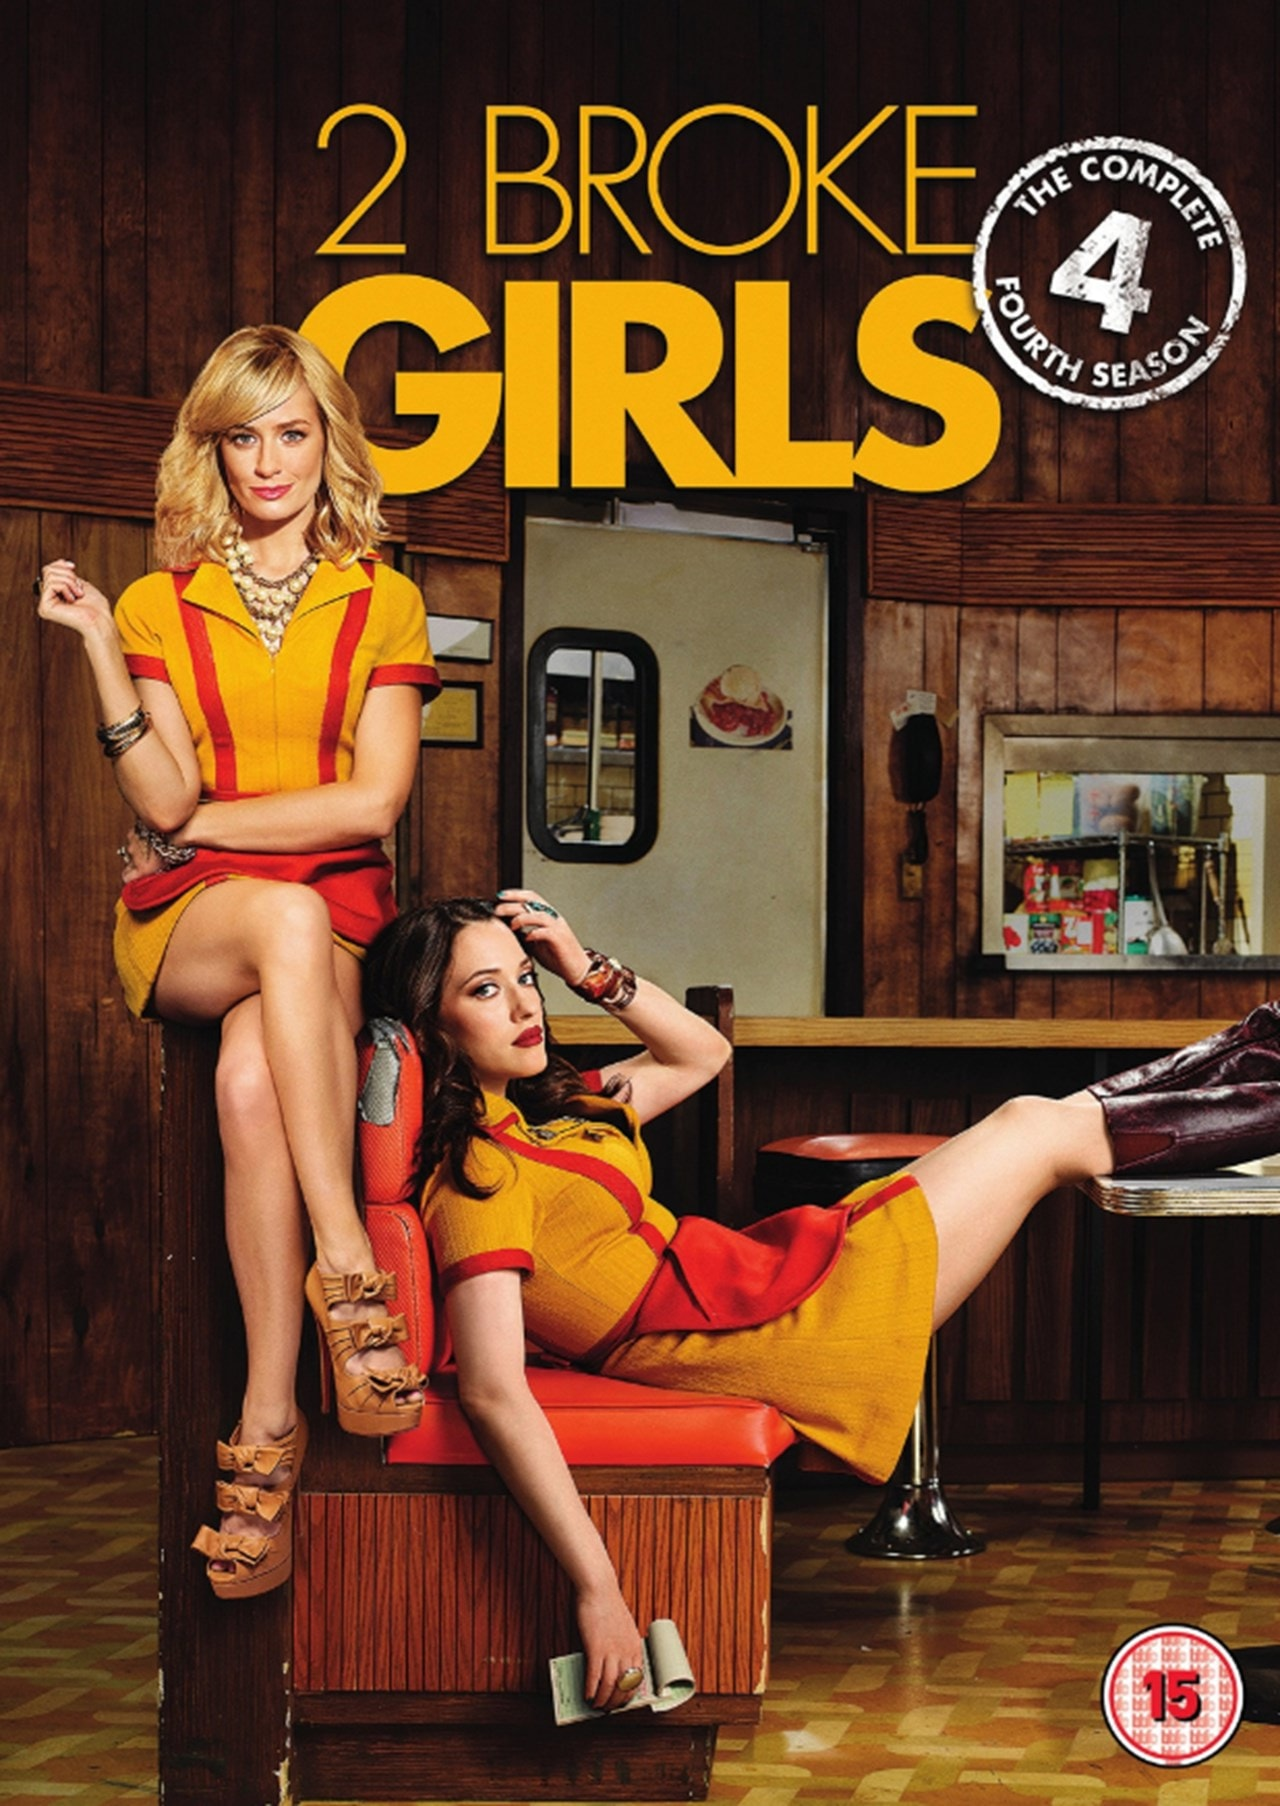 2 Broke Girls: The Complete Fourth Season - 1